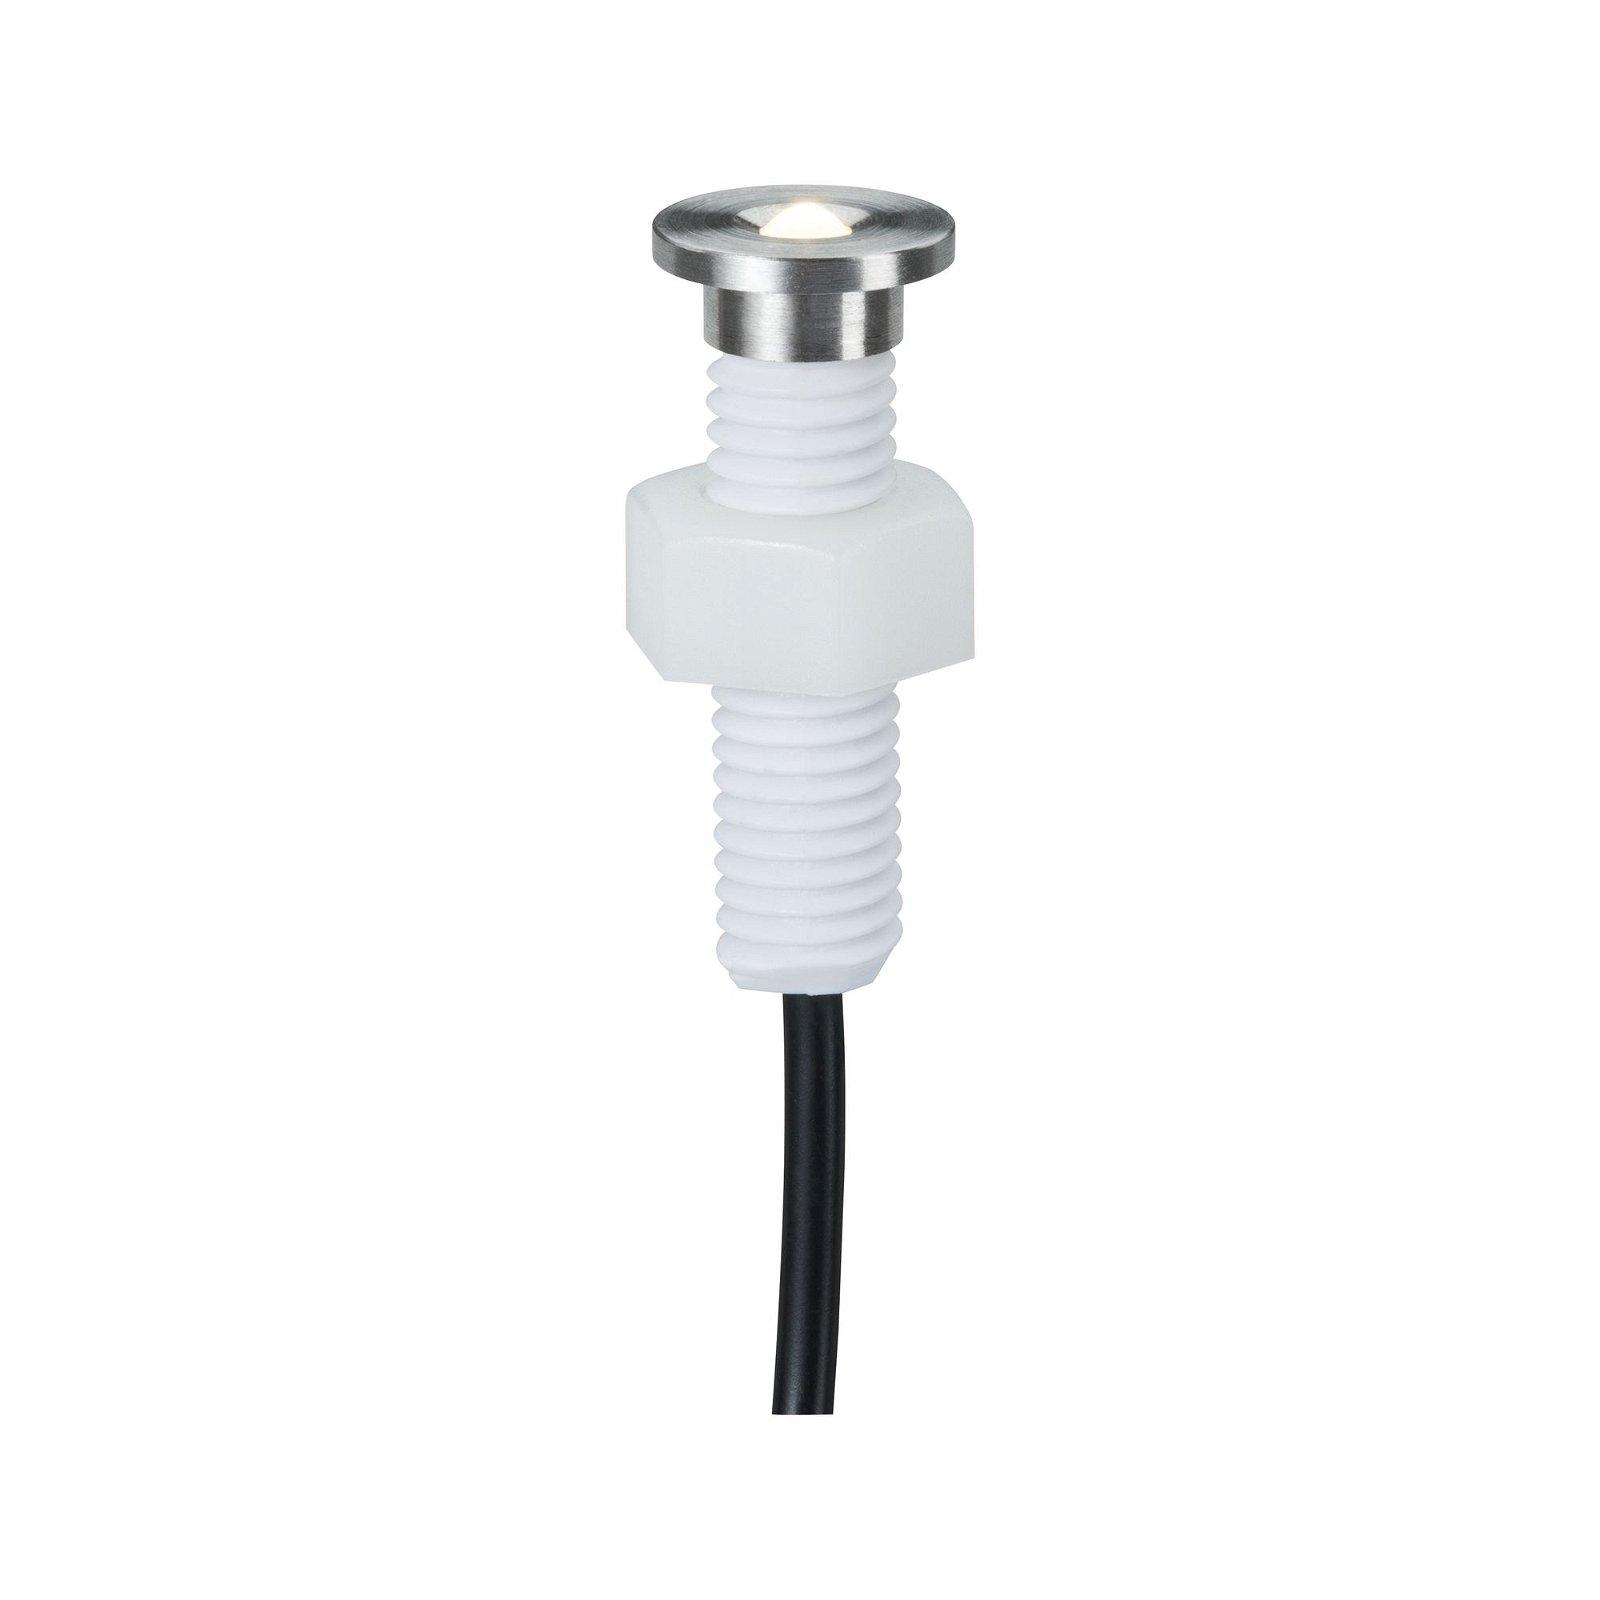 Plug & Shine LED Bodeneinbauleuchte MicroPen II Basisset IP67 3000K 5x0,22W 21VA Silber